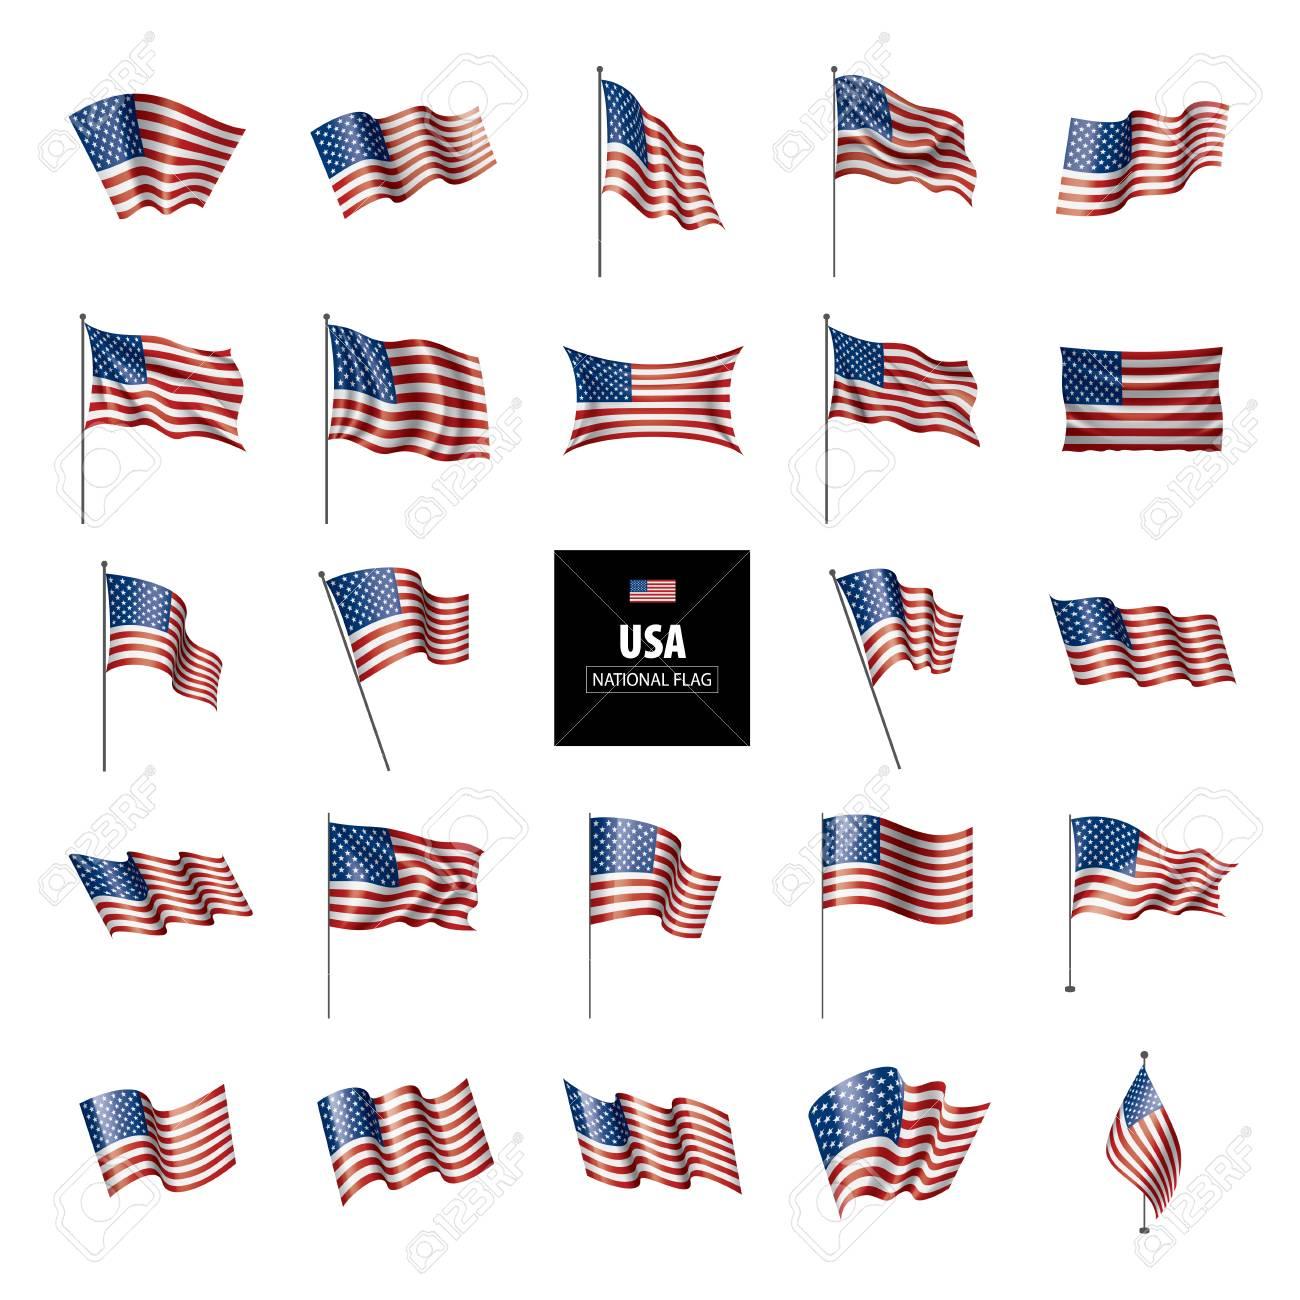 USA flag, vector illustration on a white background - 105843762